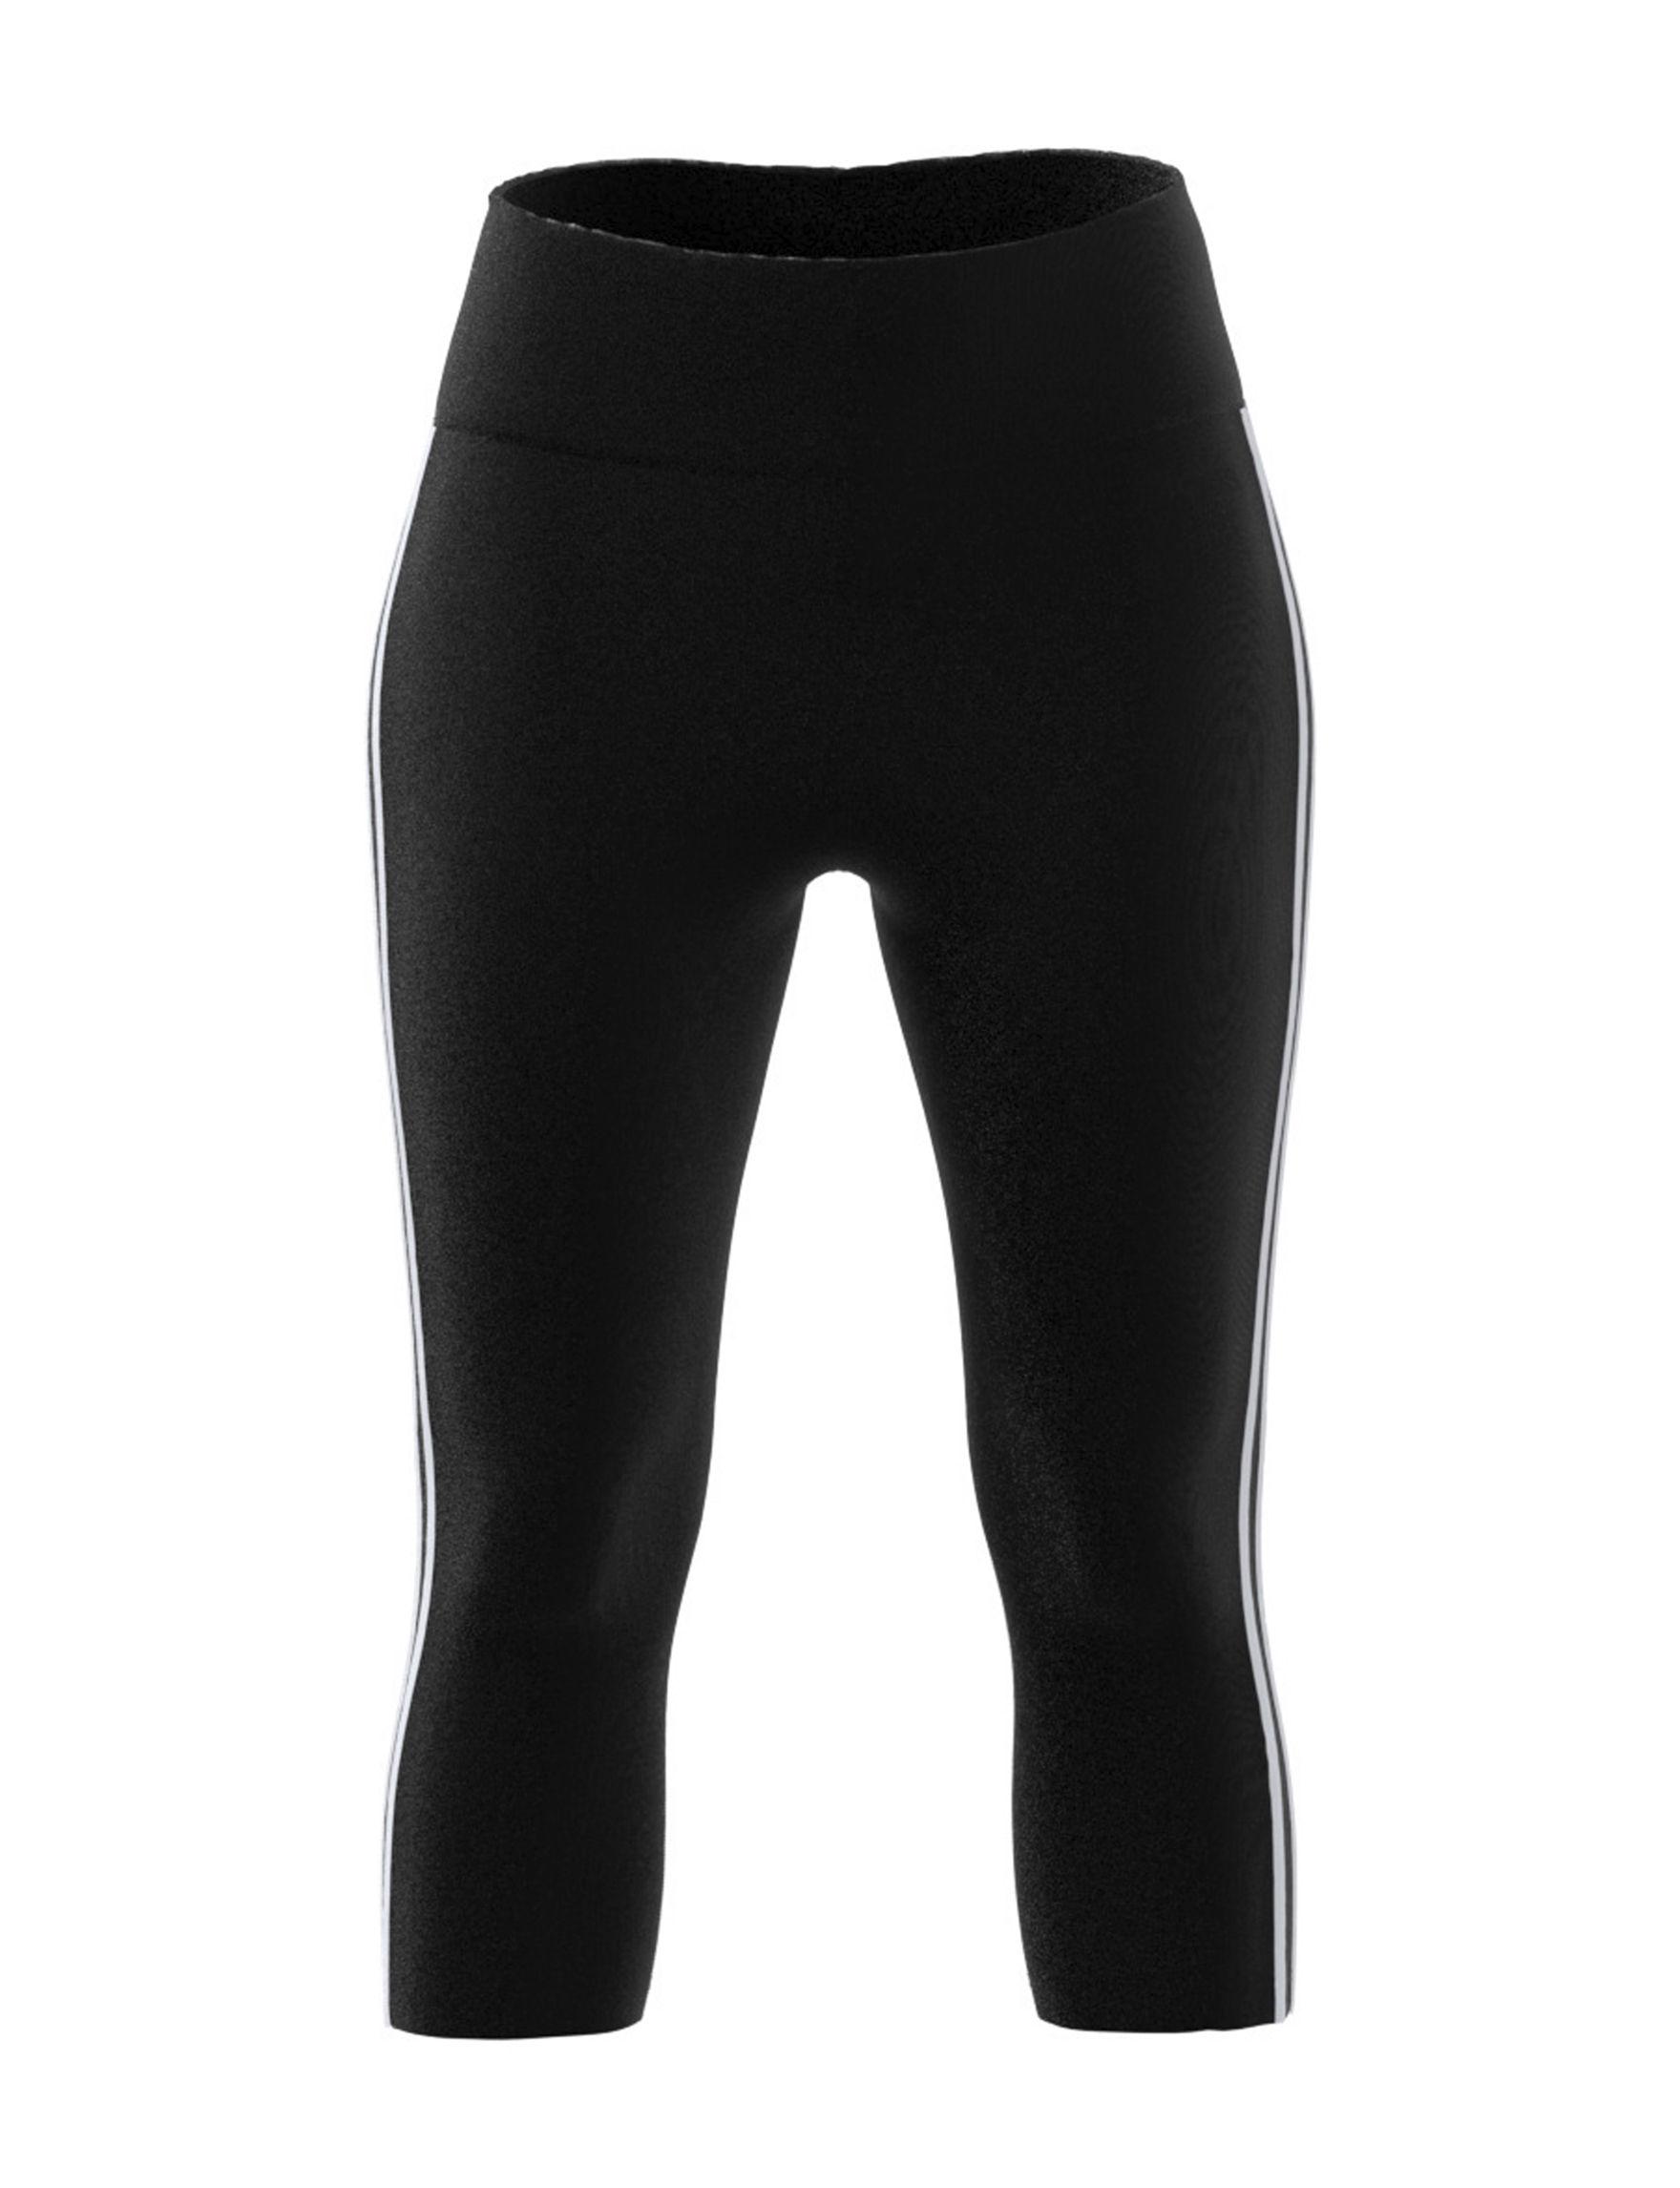 Adidas Black / White Capris & Crops